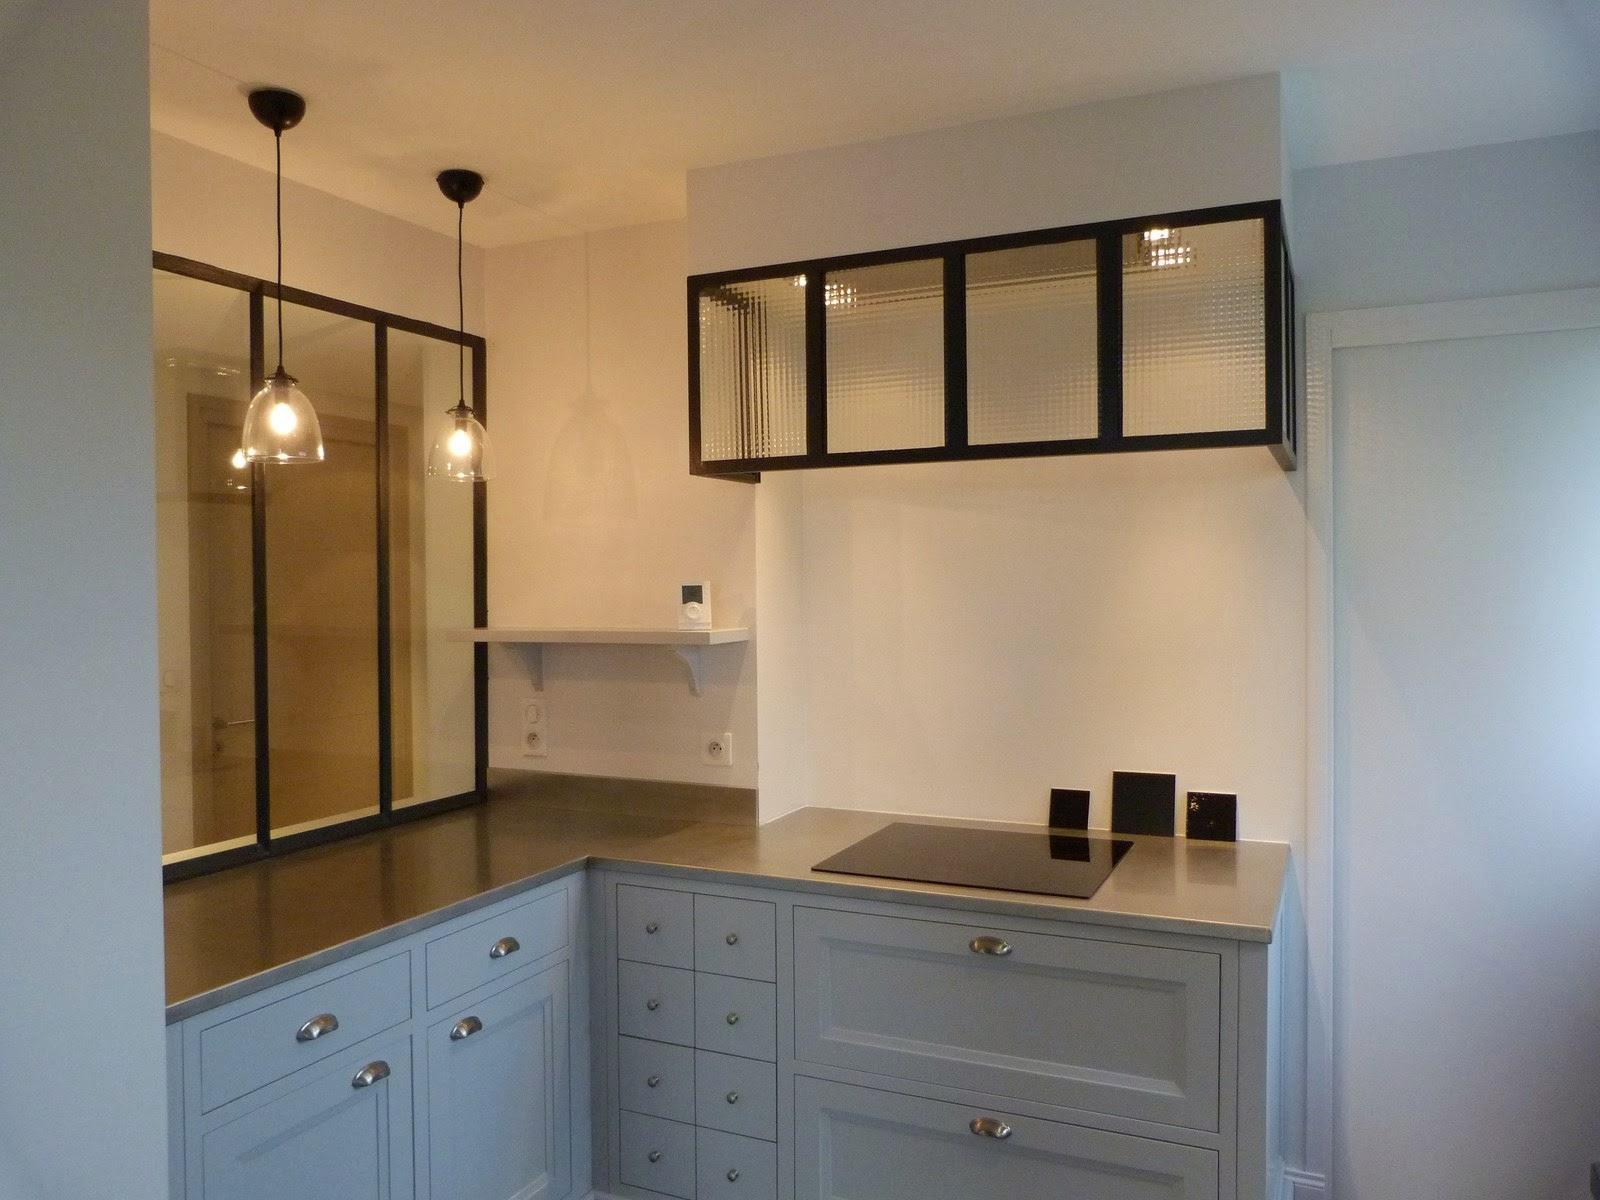 plan de travail cuisine en zinc faade de cuisine en zinc avec poigne en inox peut tre ralis en. Black Bedroom Furniture Sets. Home Design Ideas